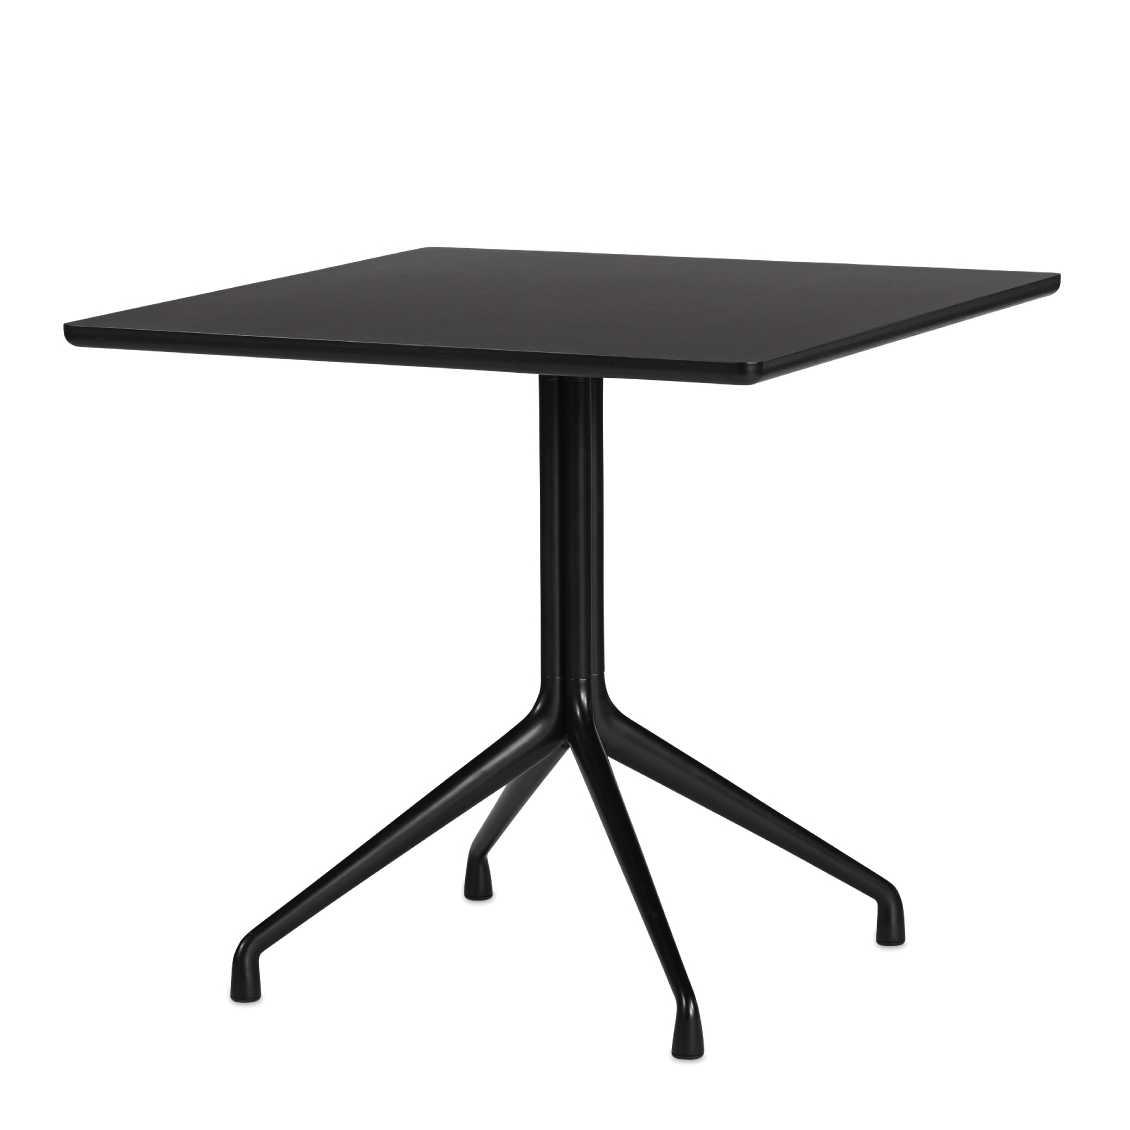 HAY About A Table AAT15 H 73 Cm BlackWhite Eettafel